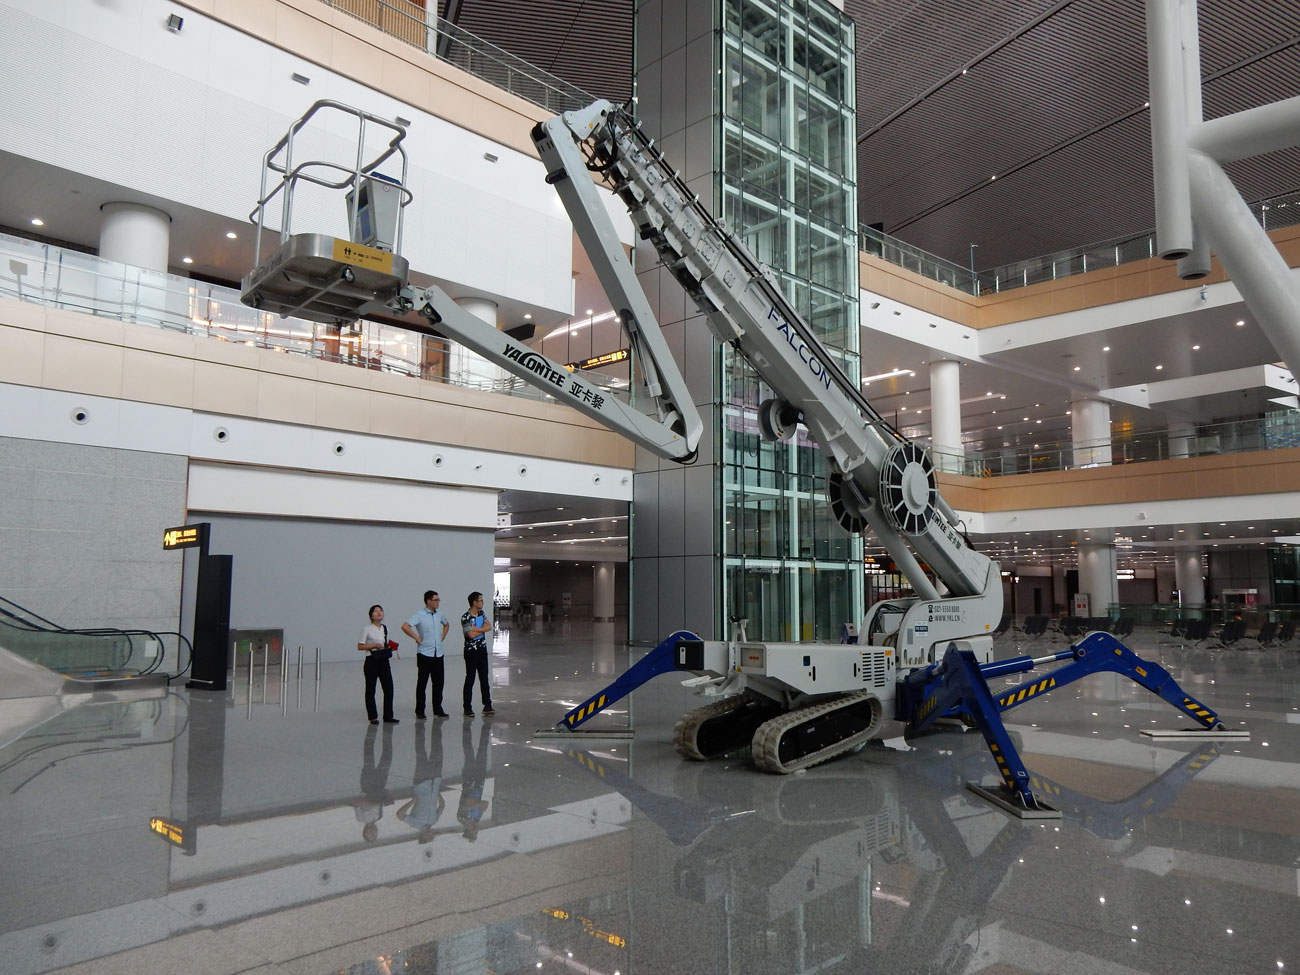 FS 520C Falcon Spider crawler lift - compact, lightweight